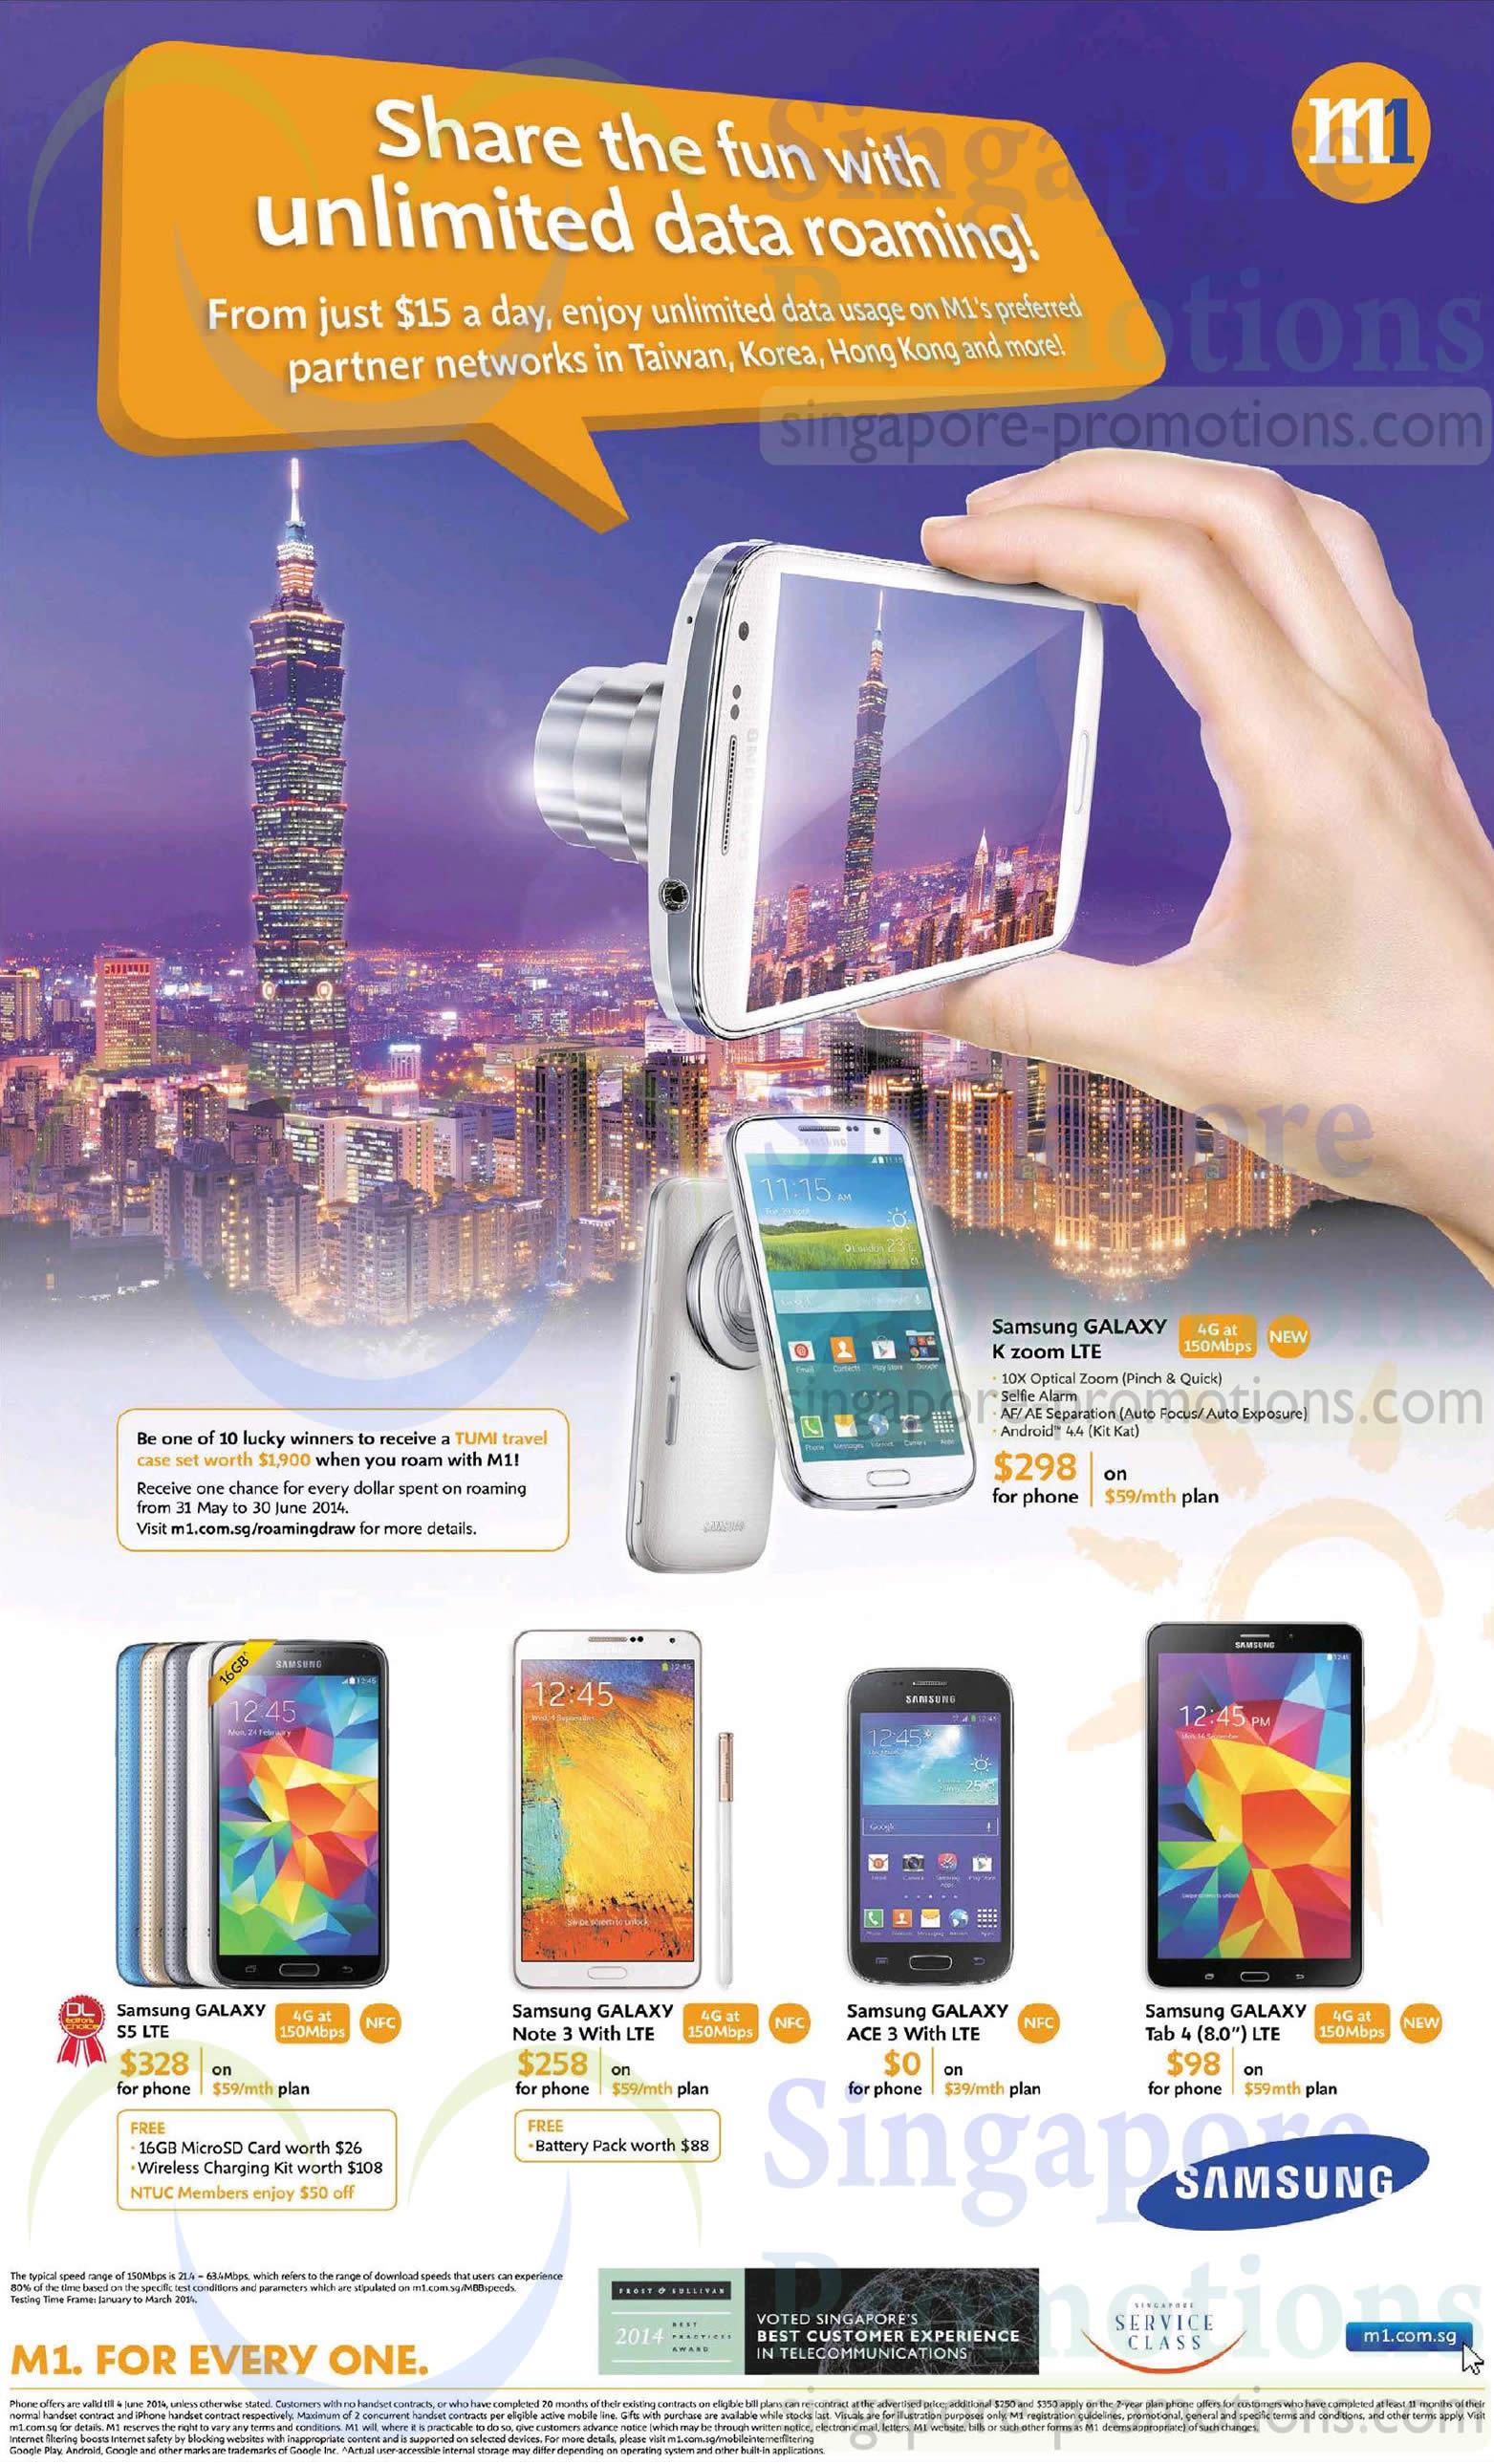 Samsung Galaxy K Zoom S5 Note 3 Ace 3 Tab 4 80 M1